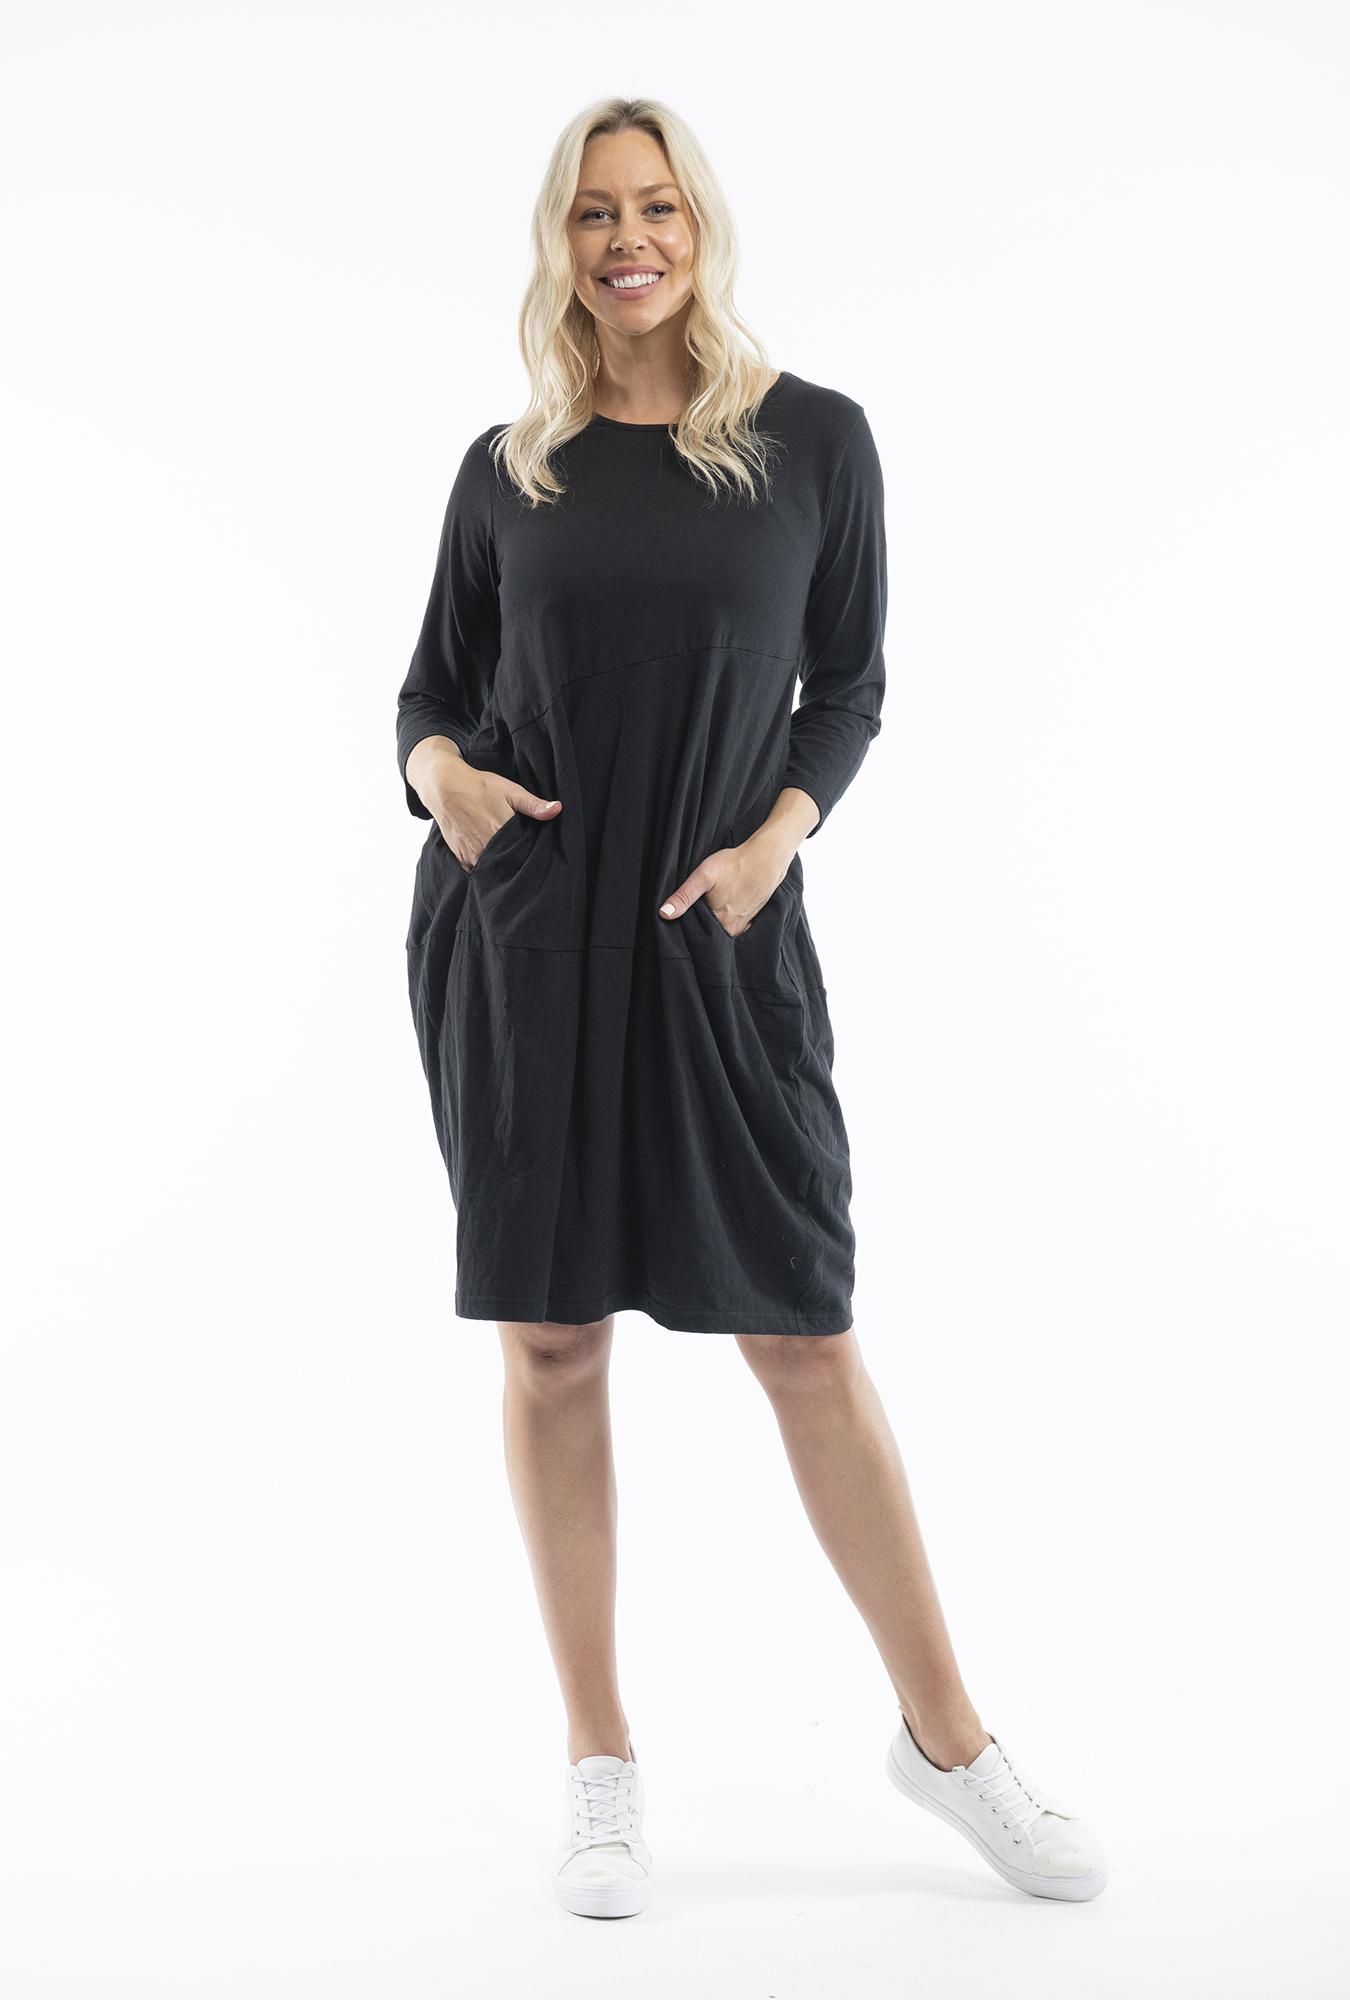 Black Bubble Dress